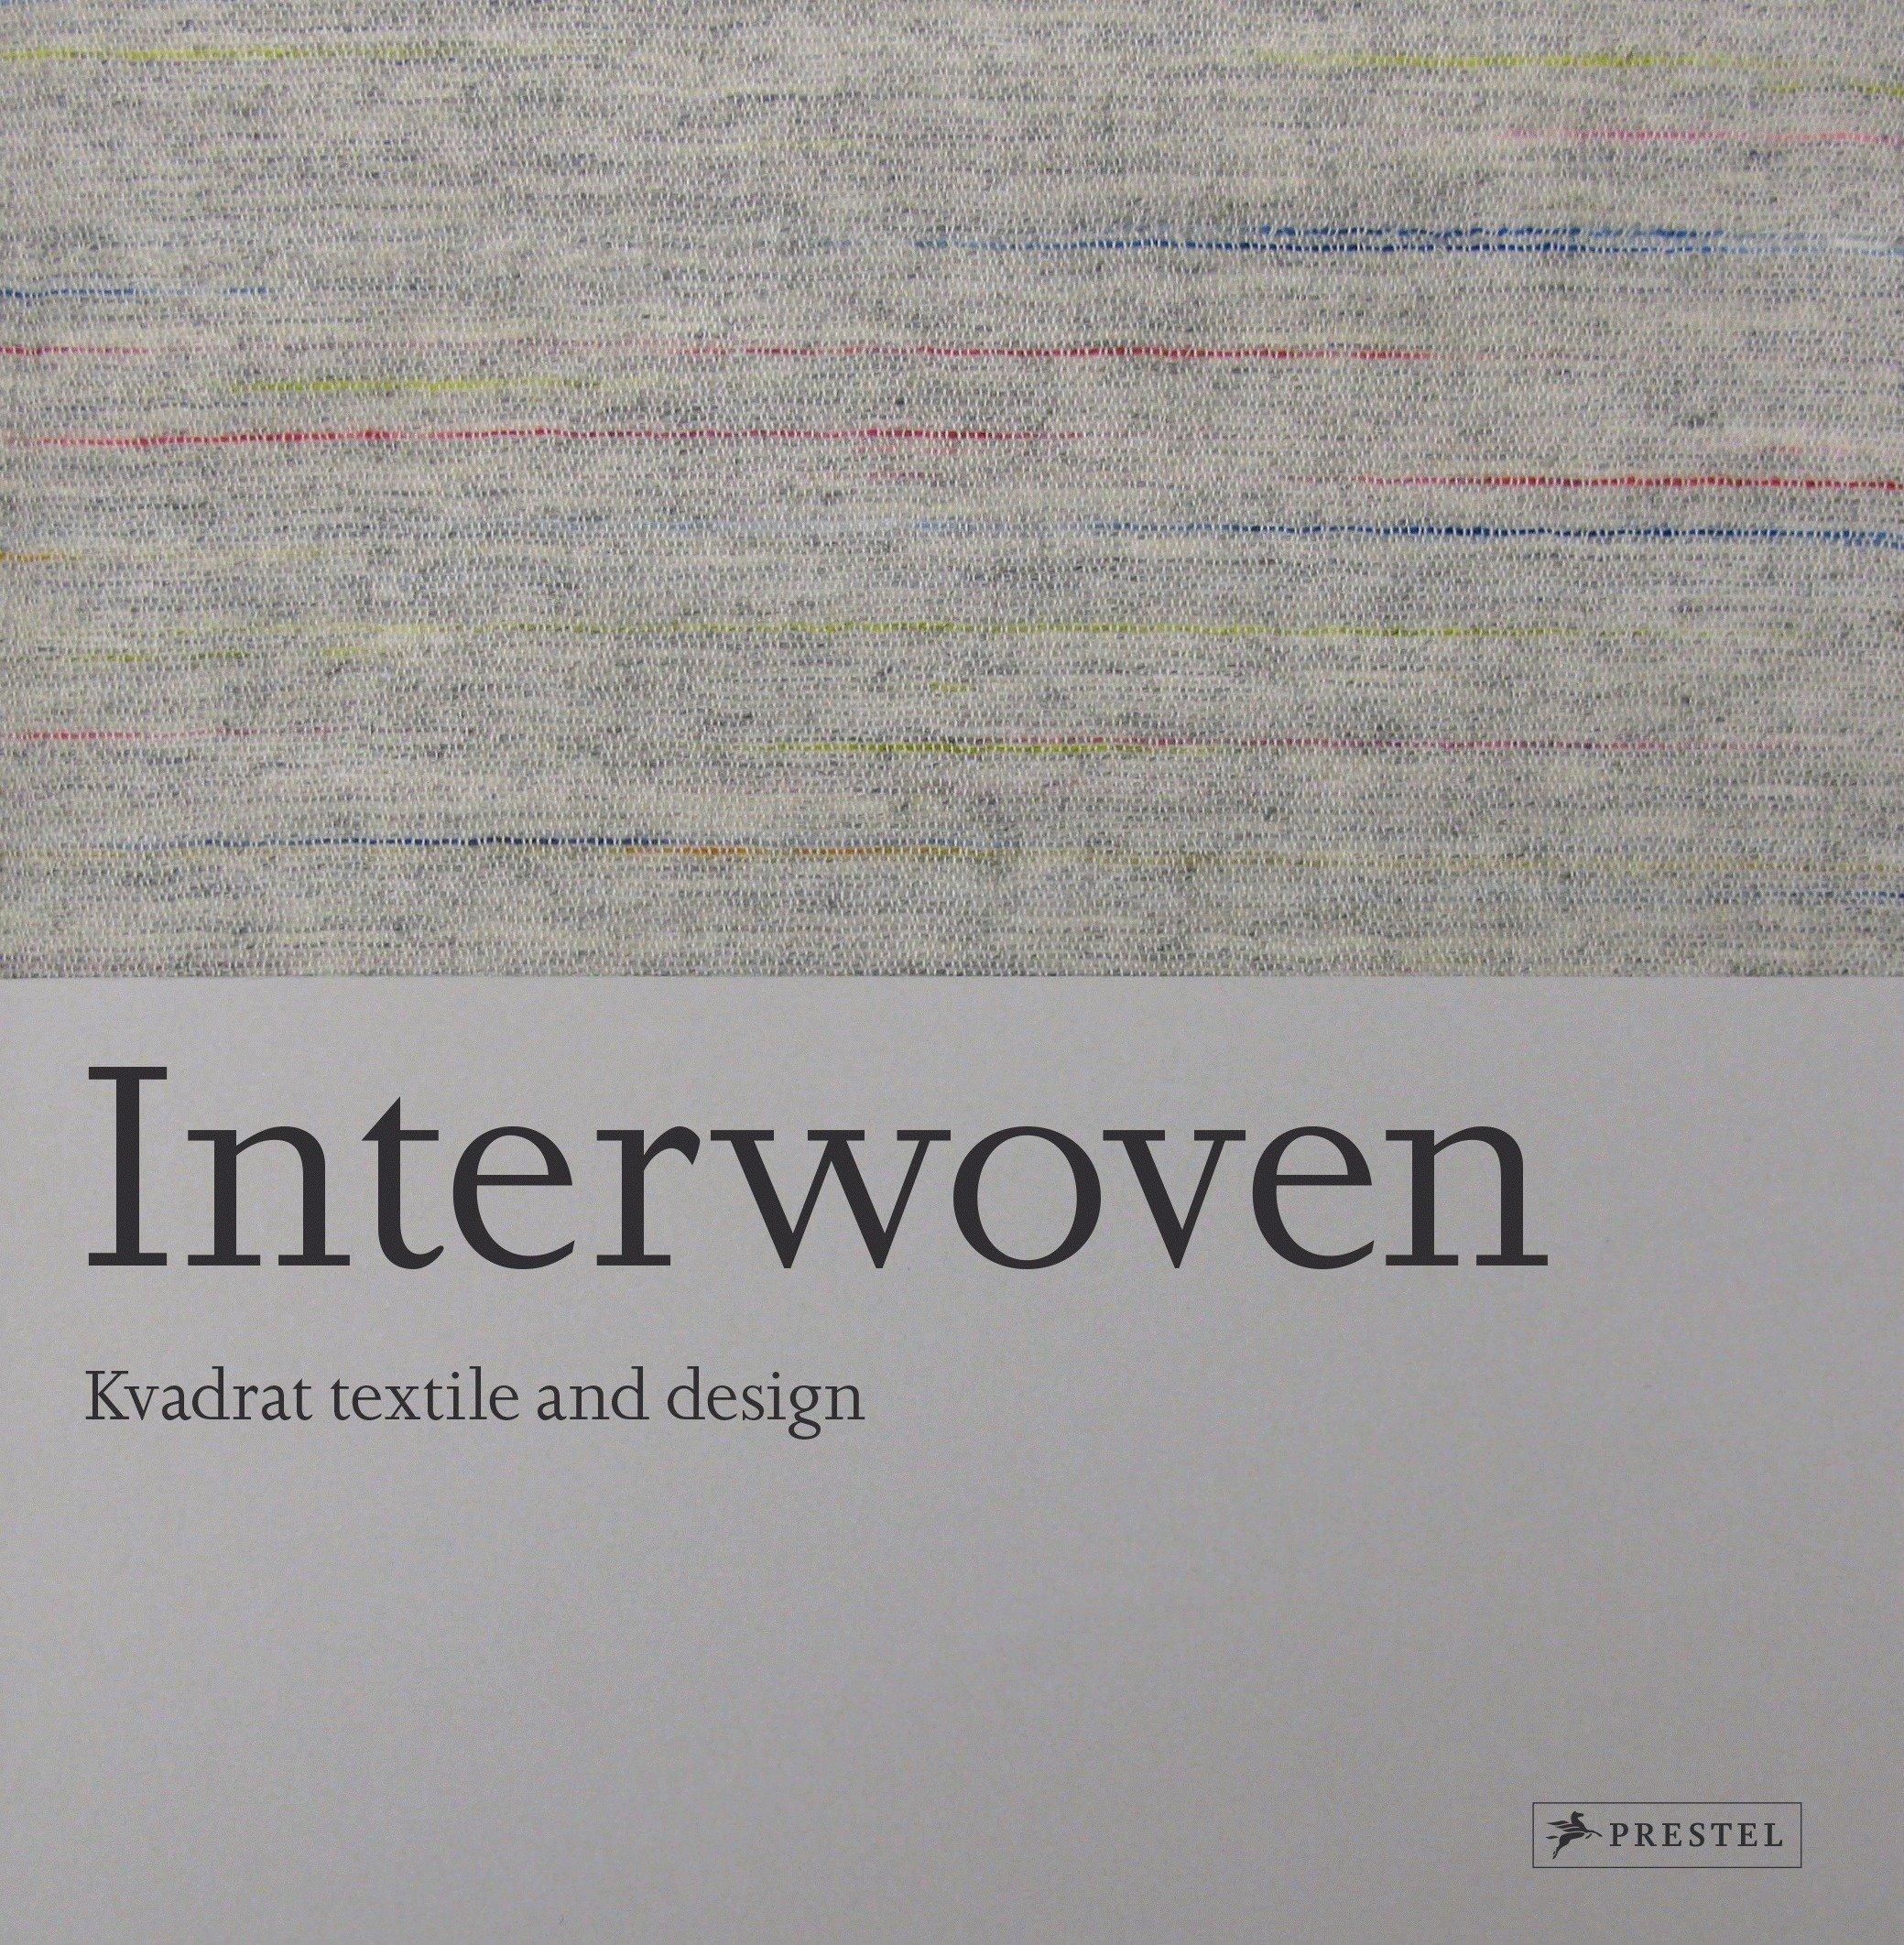 Interwoven: Kvadrat Textile and Design